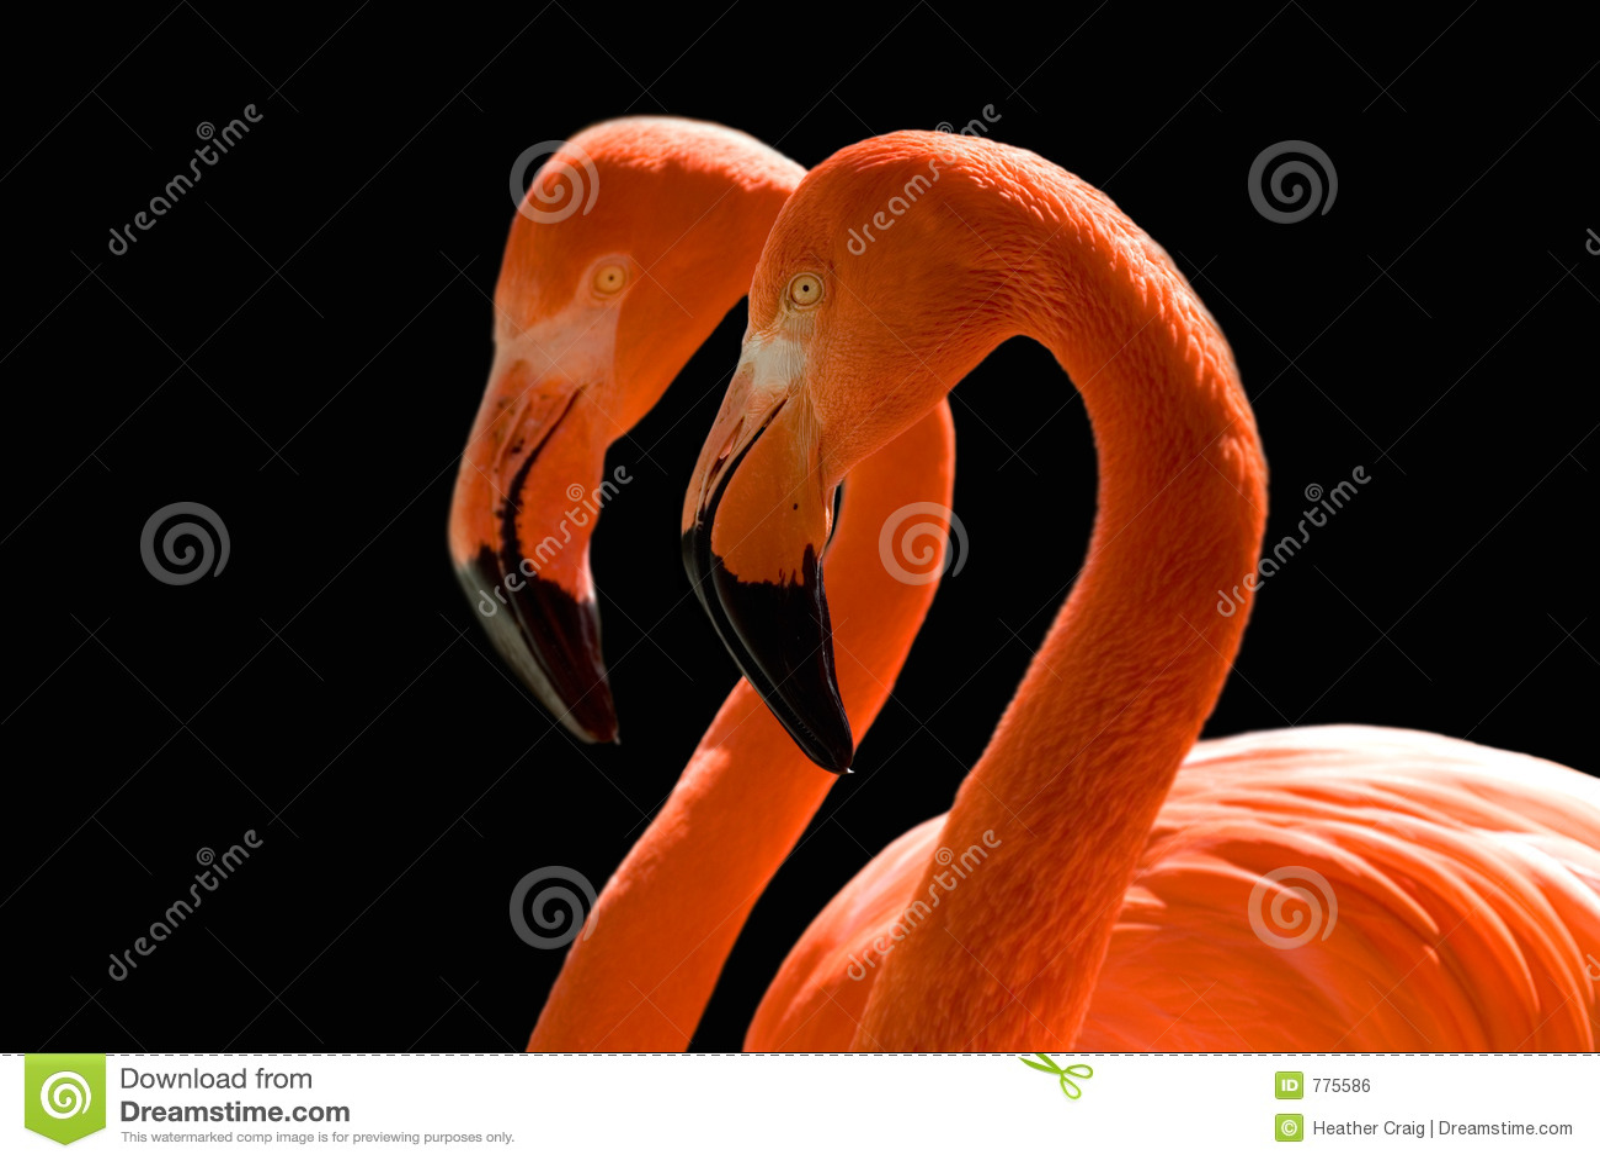 Dancing Flamingos on Black